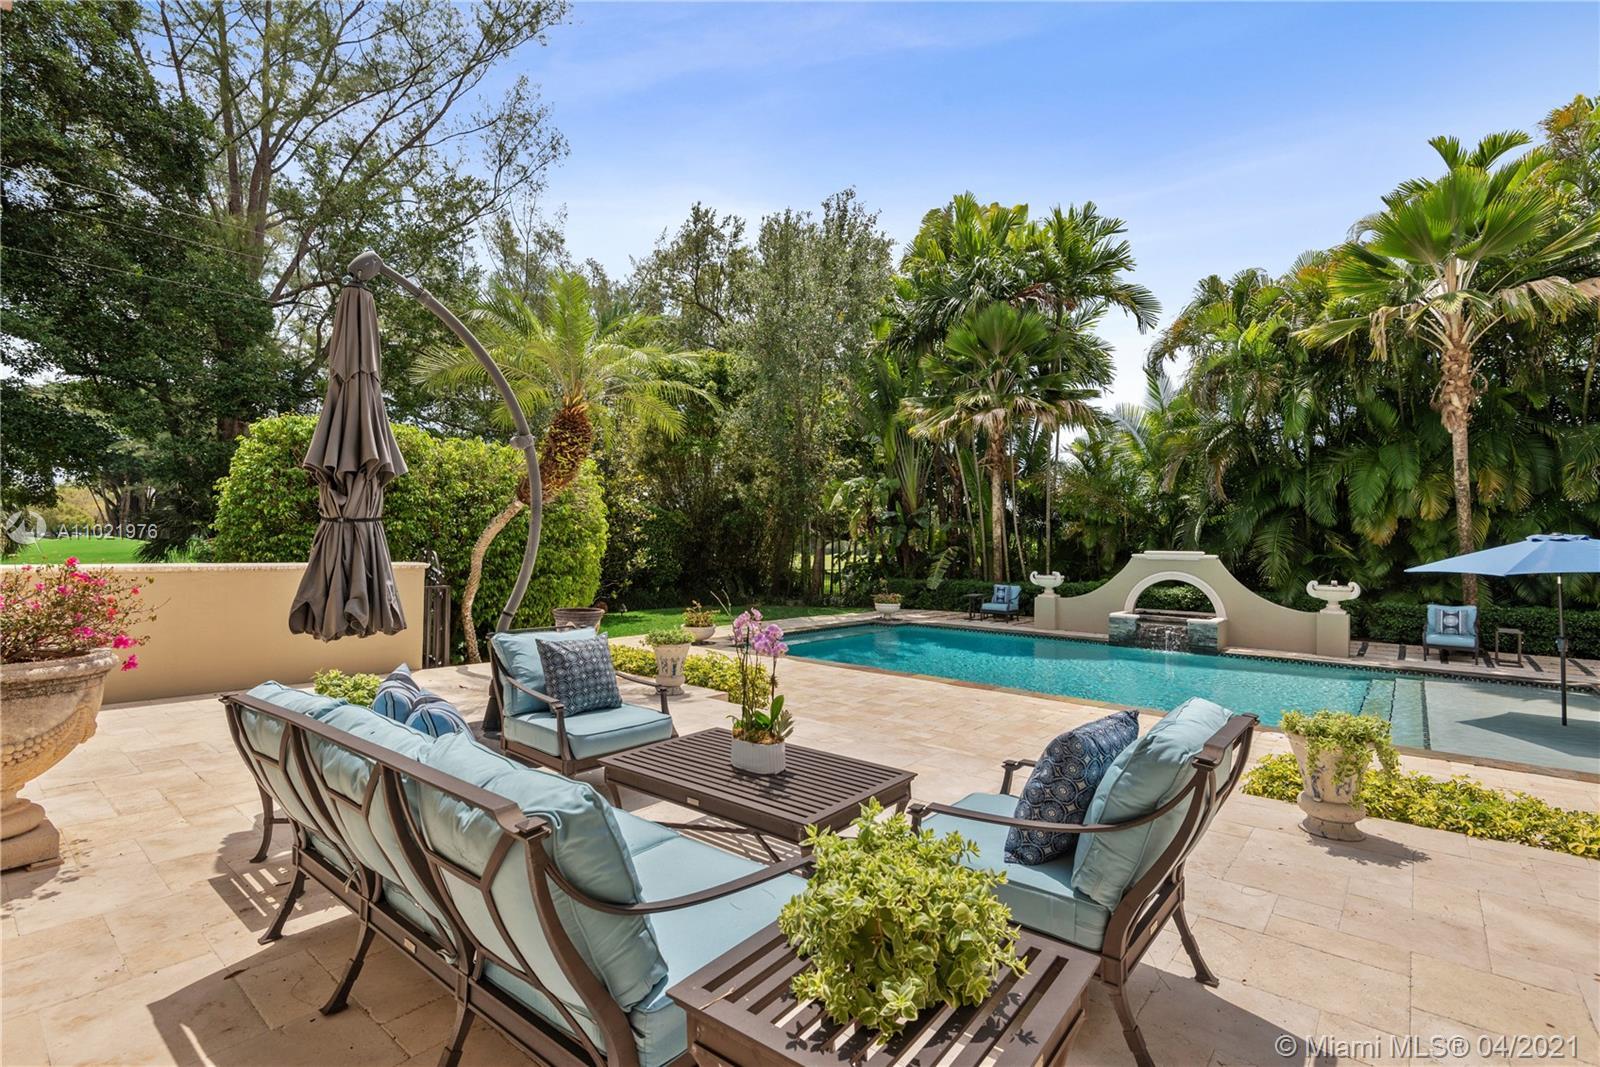 Resort style outdoor patio/pool area.